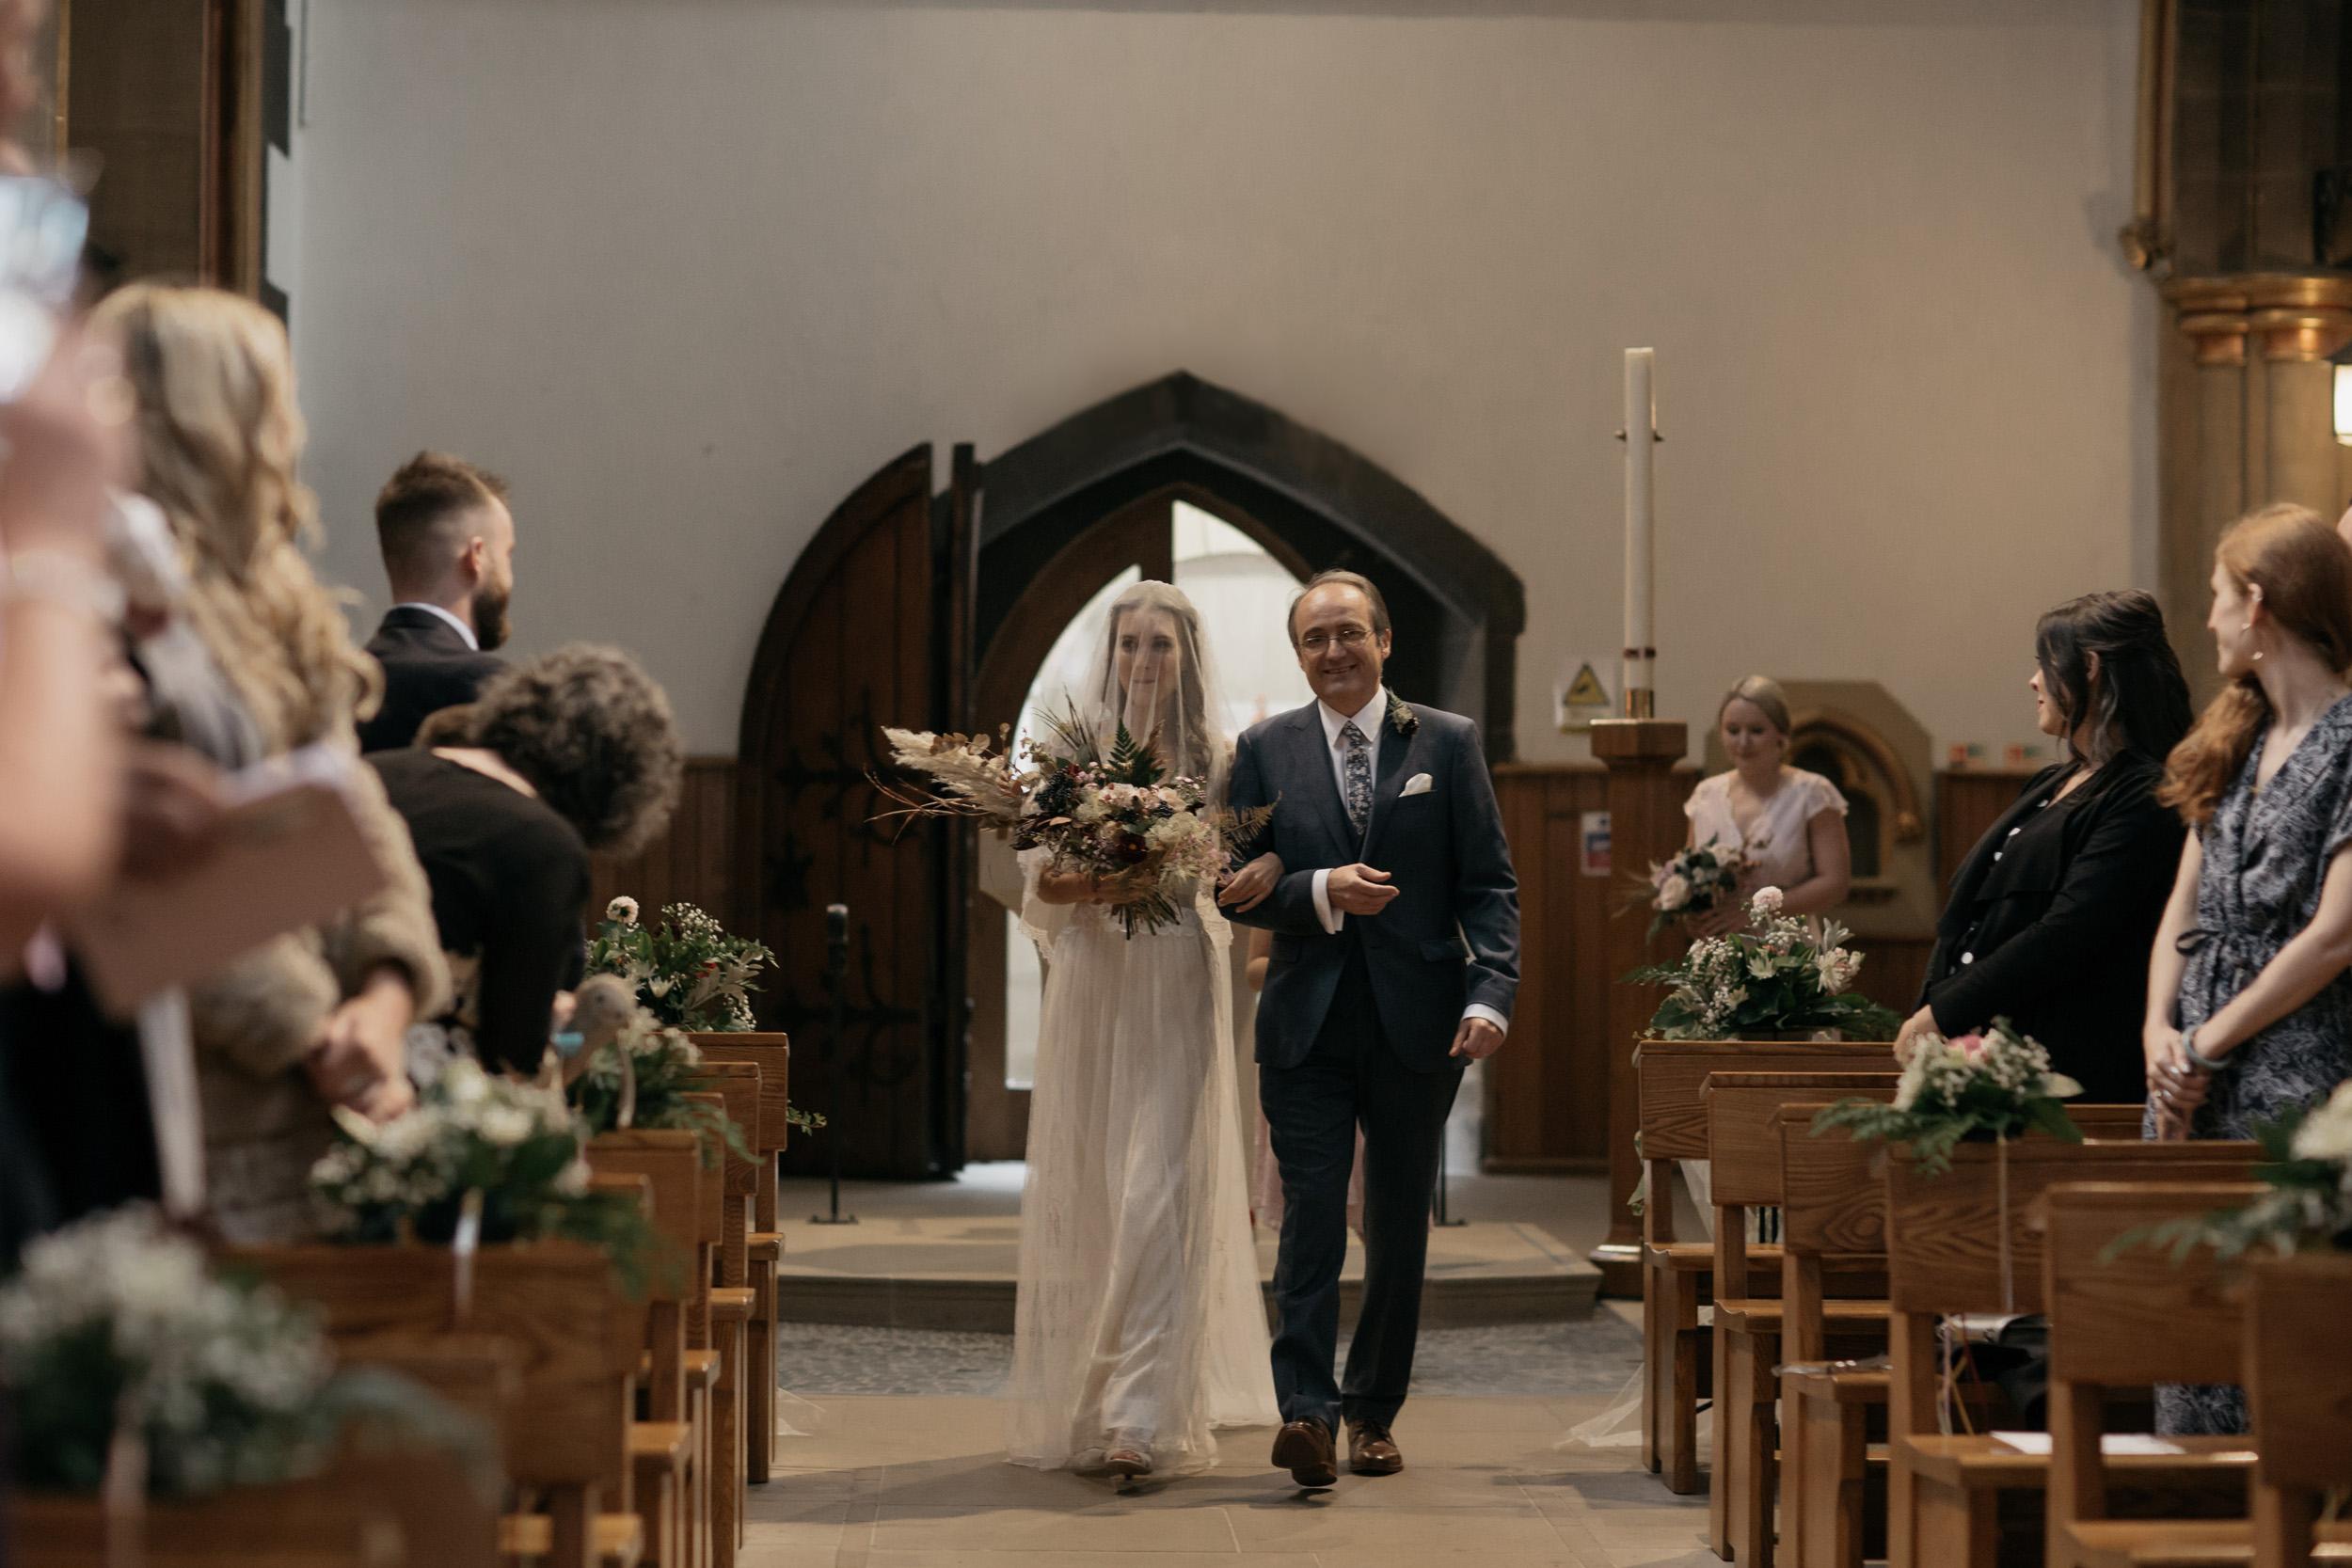 Joasia-Kate-Beaumont-Bohemian-Lace-Wedding-Dress-Peak-District-Sheffield-Wedding-5.jpg